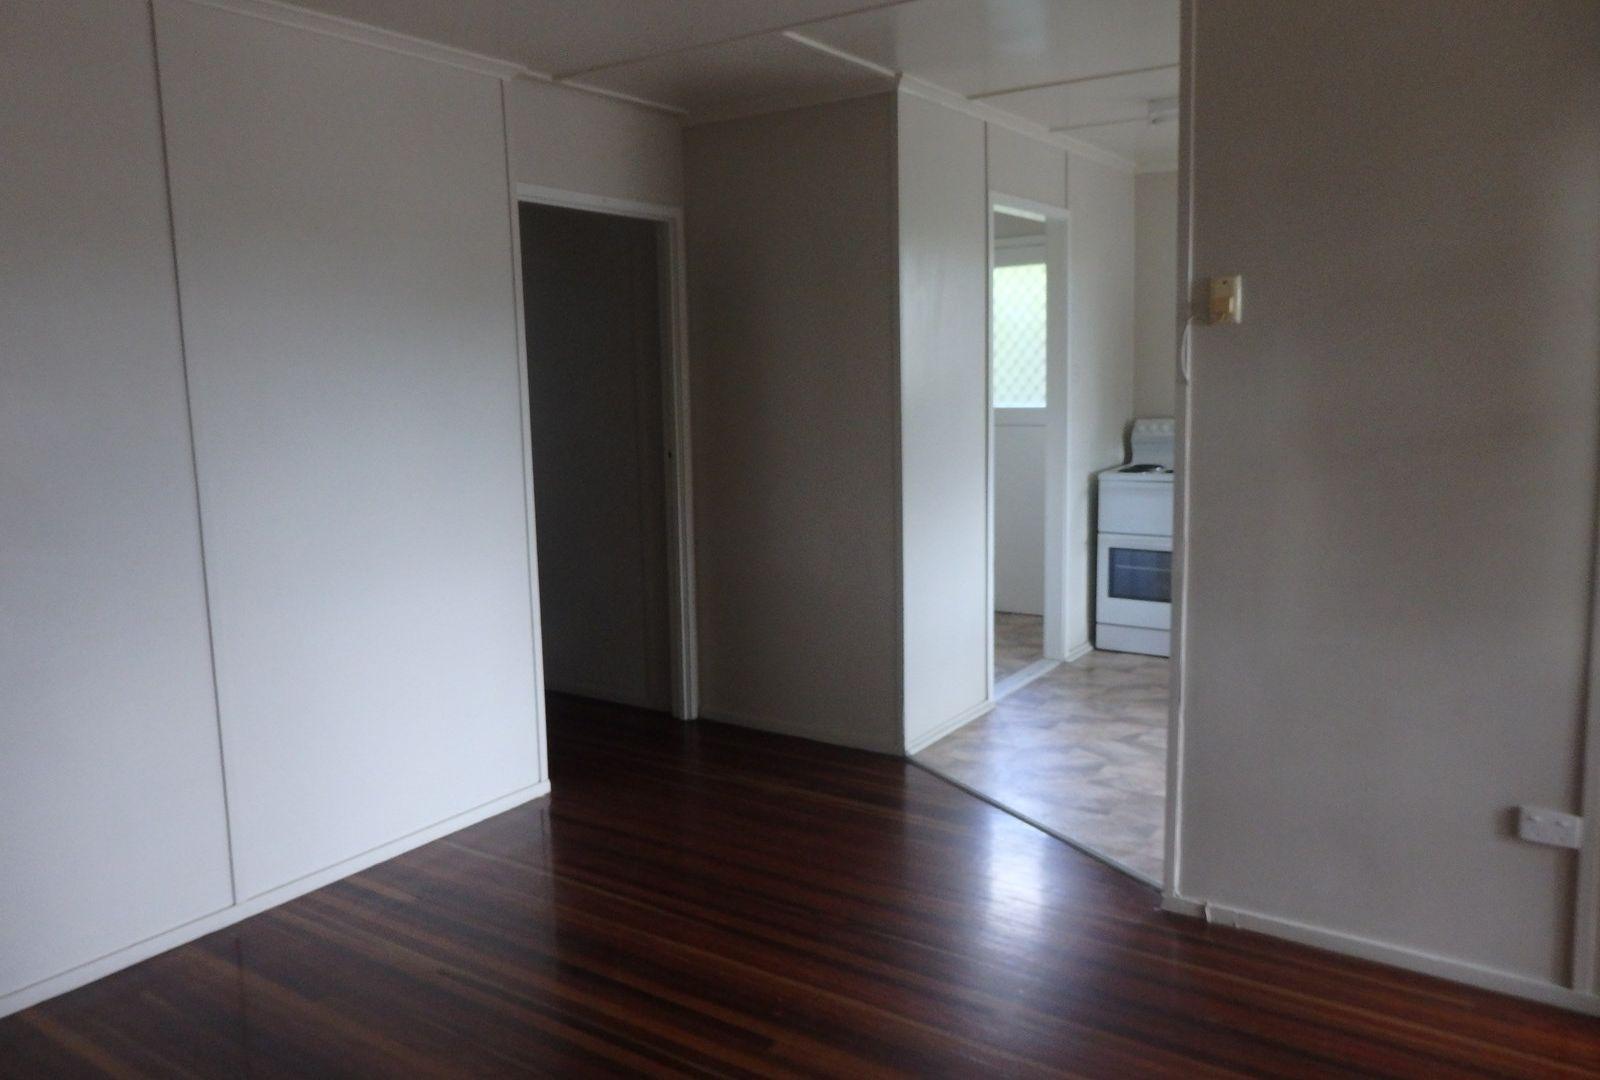 55 Littlefield St, Blackwater QLD 4717, Image 2